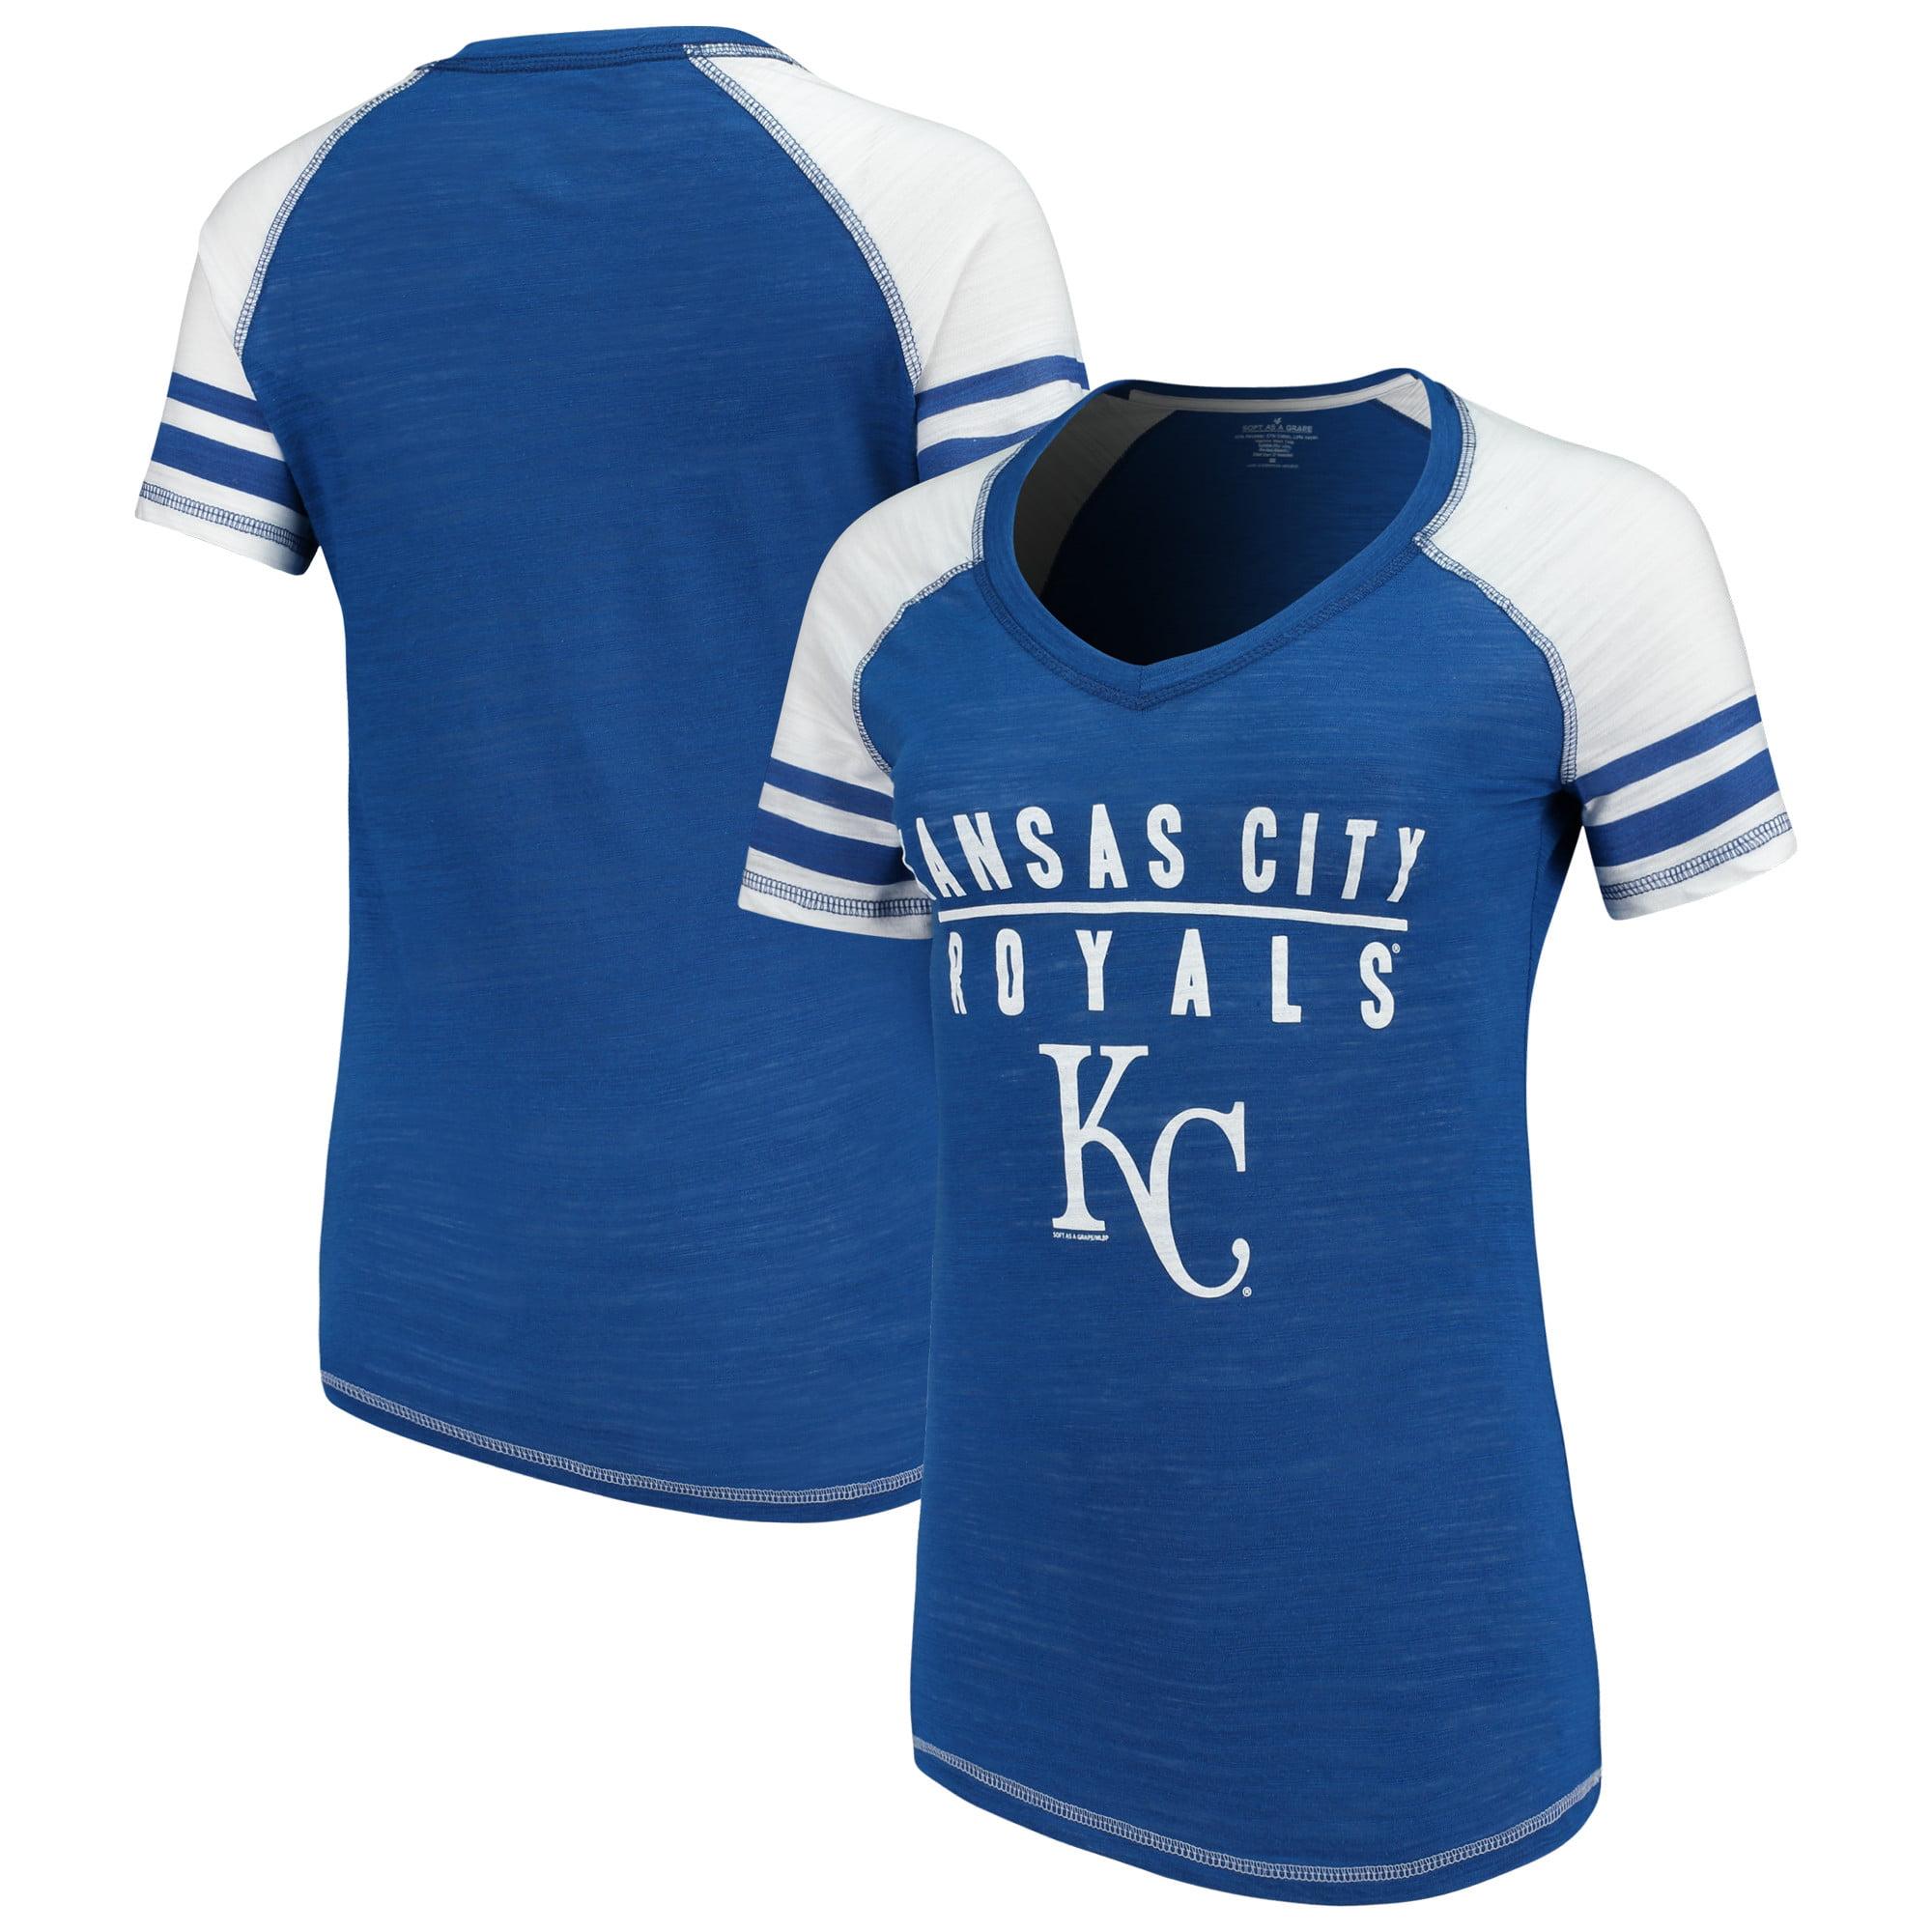 Kansas City Royals Soft as a Grape Women's Color Block V-Neck T-Shirt - Royal